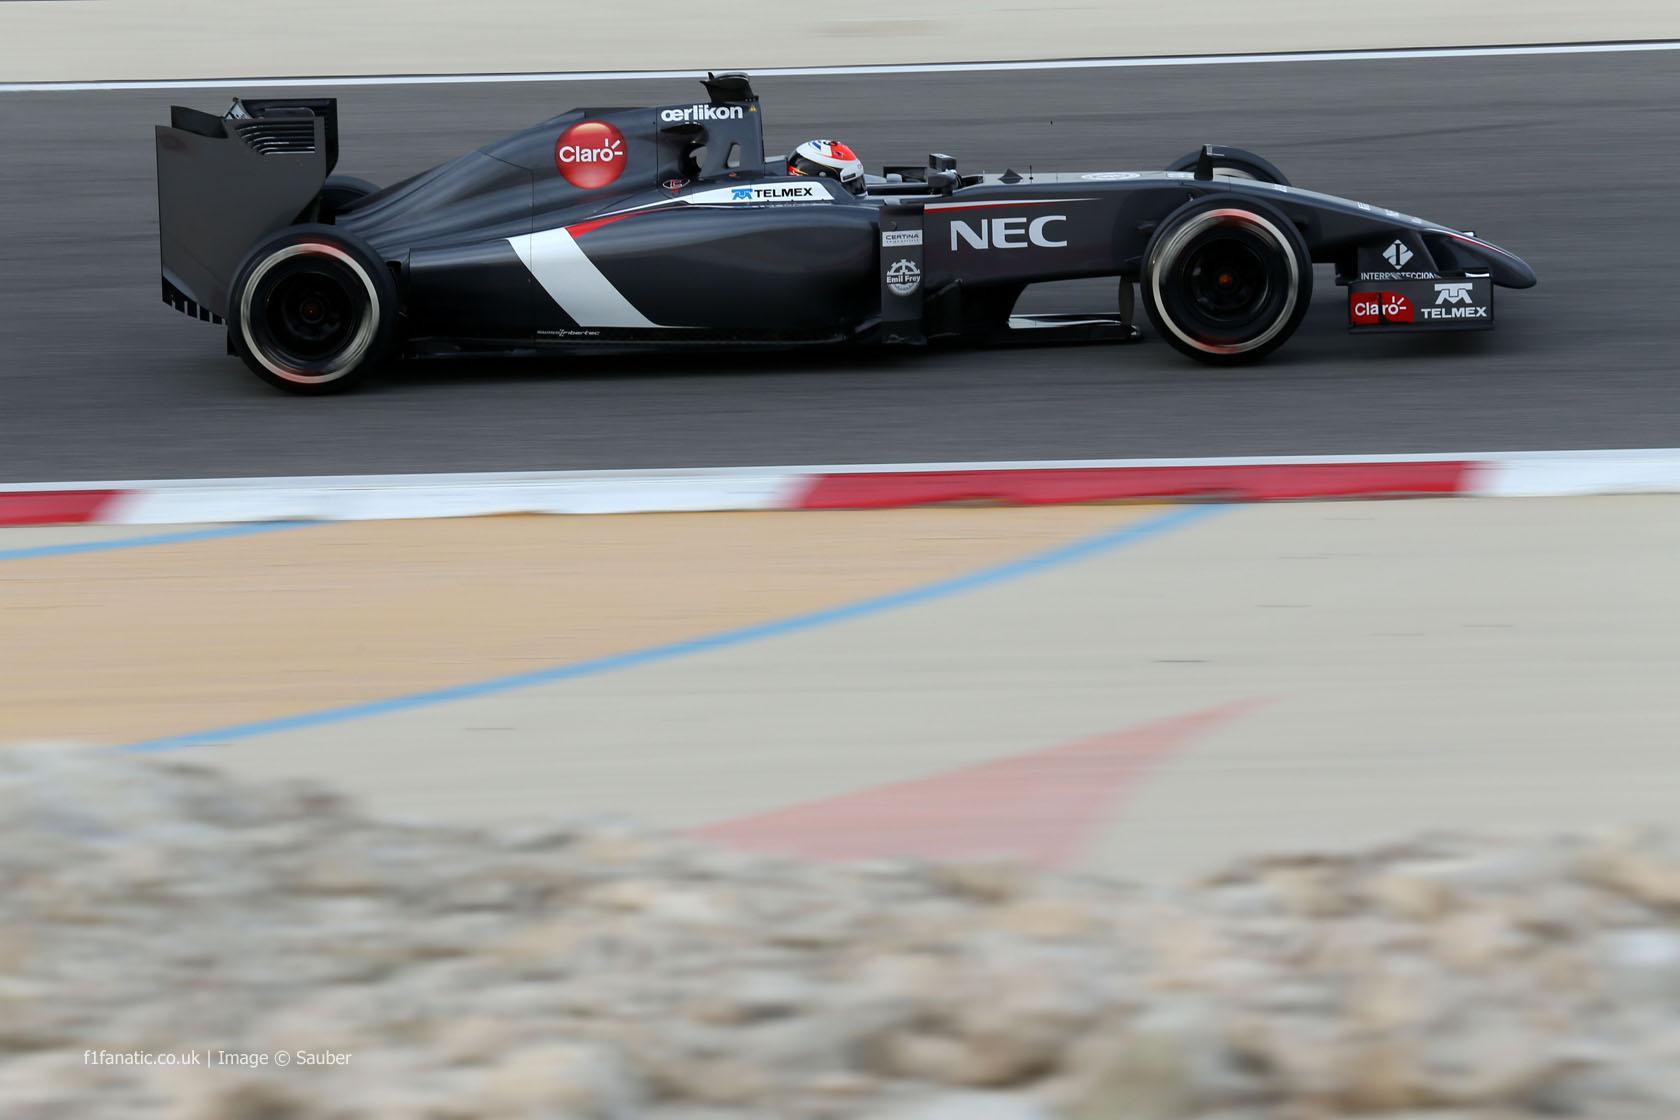 Adrian Sutil, Sauber, Bahrain, 2014